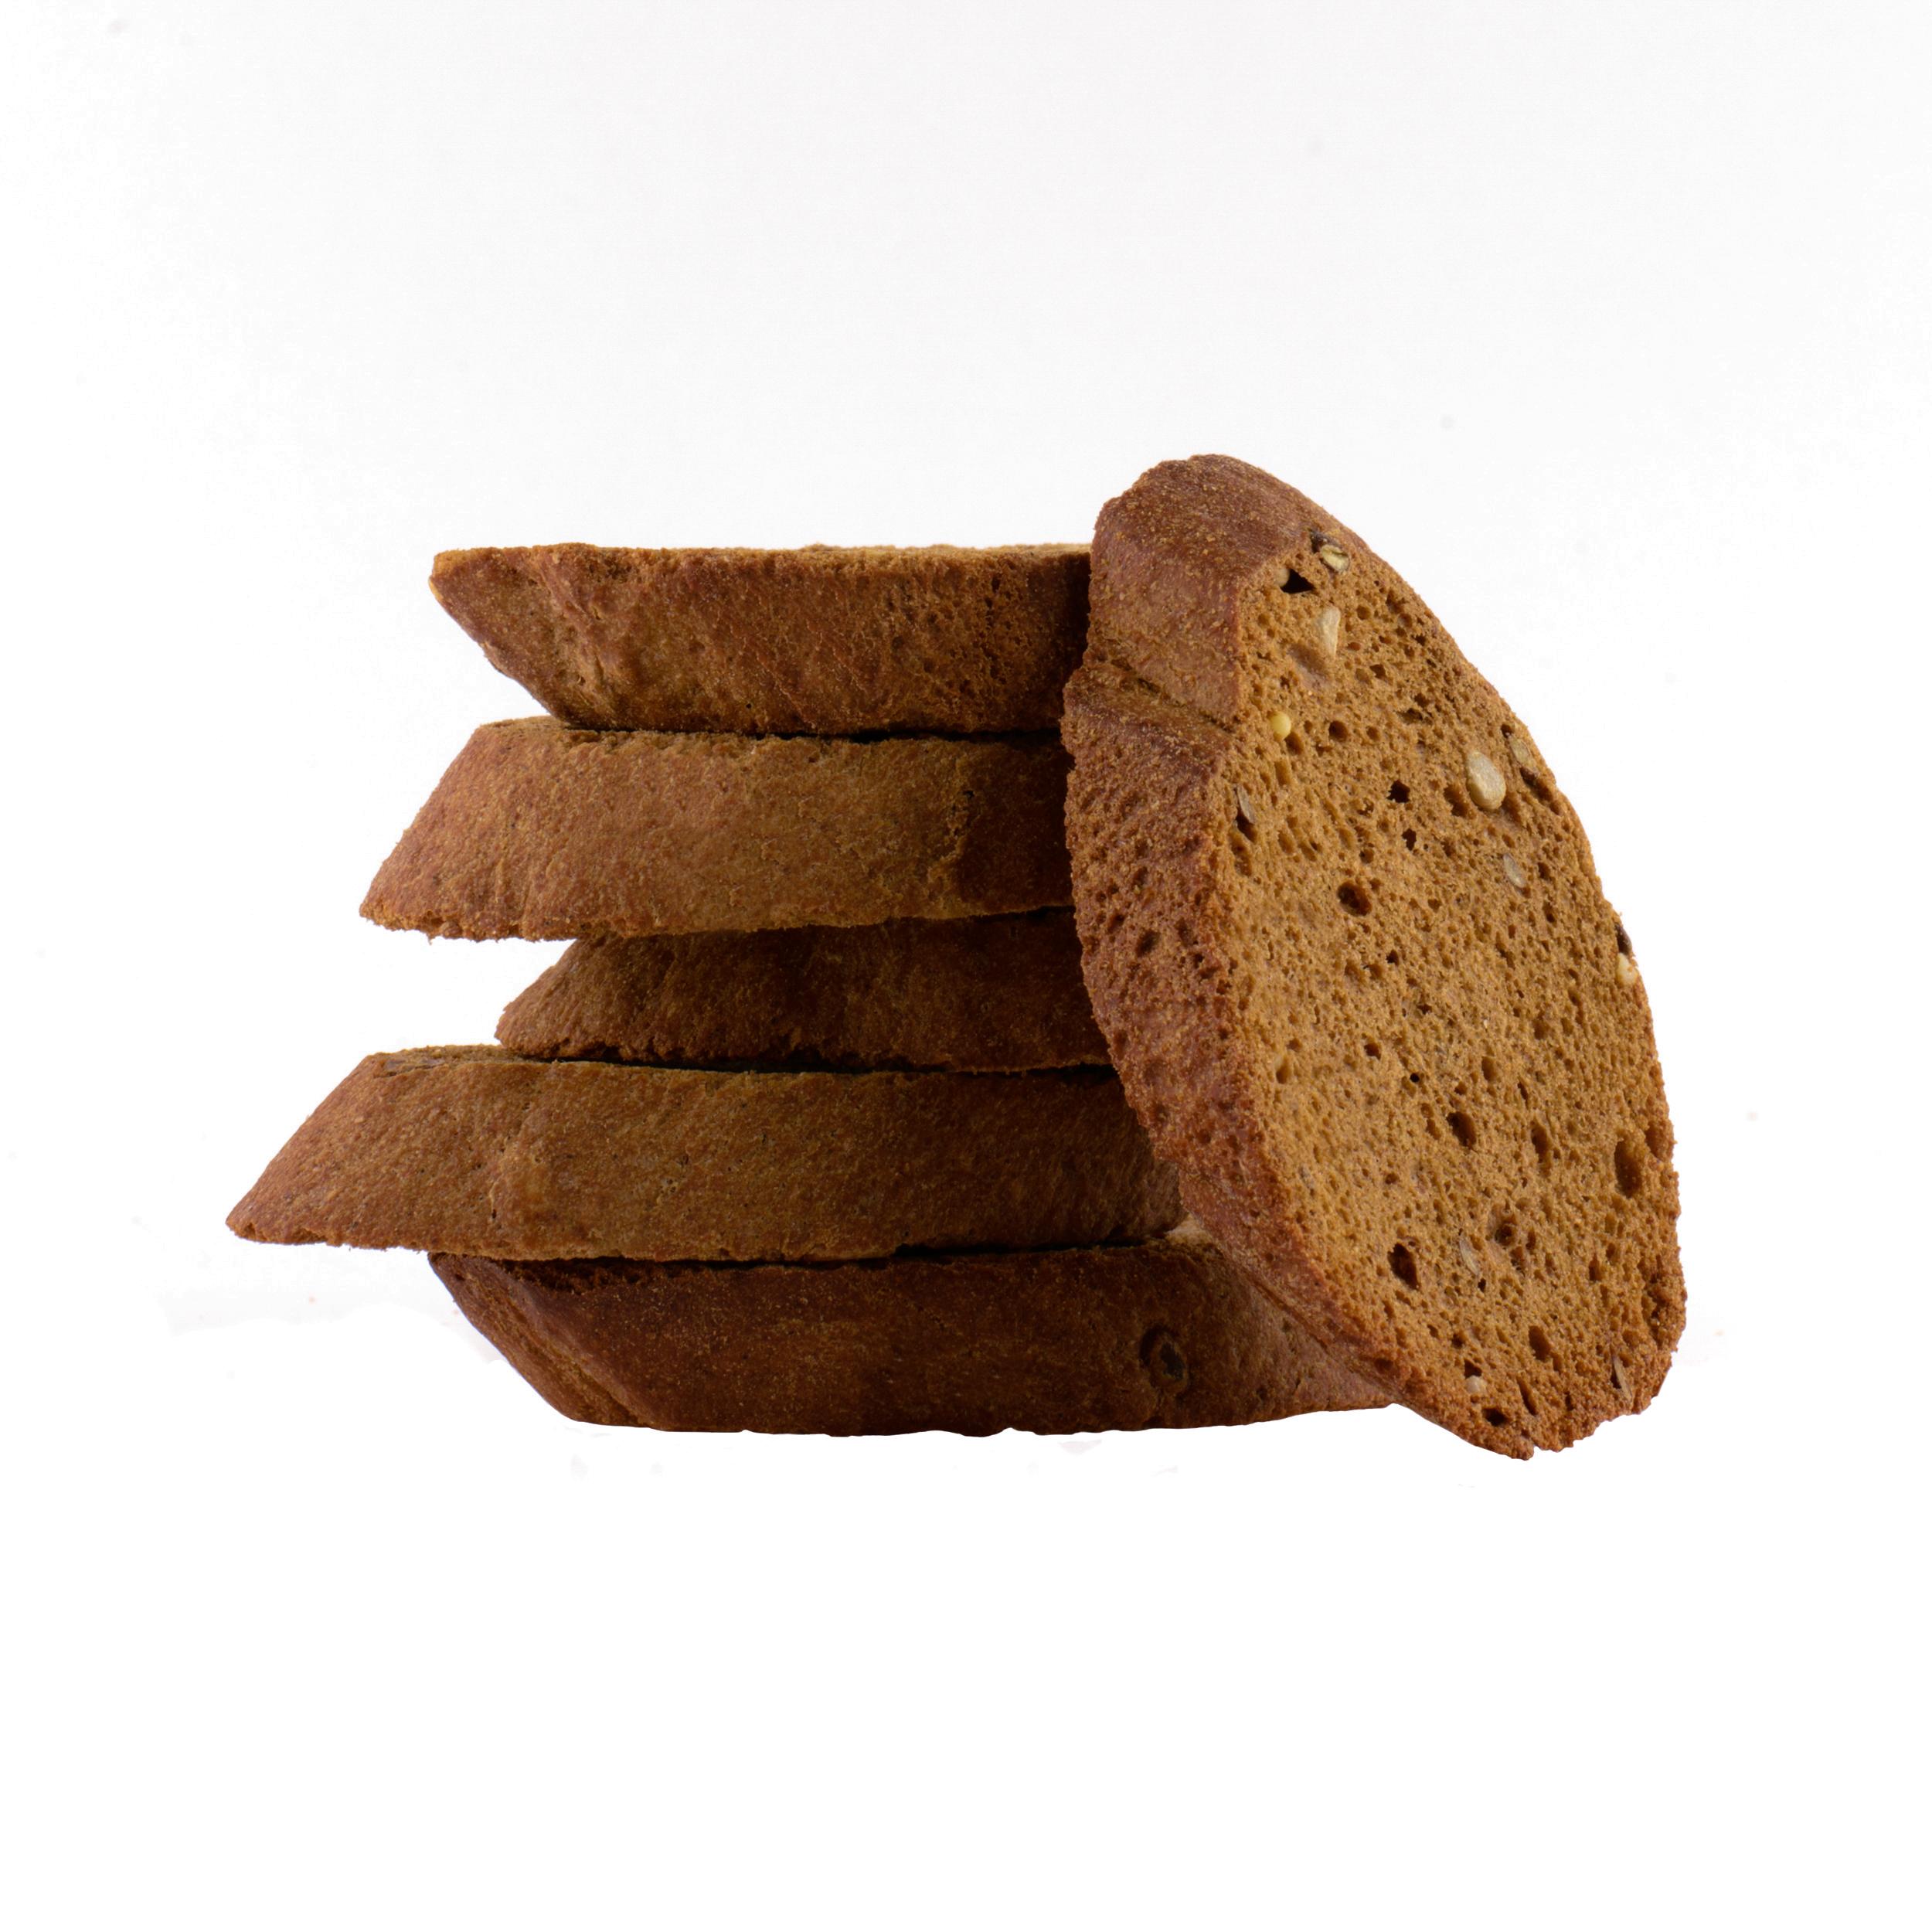 Baguette_Toast_Multigrain